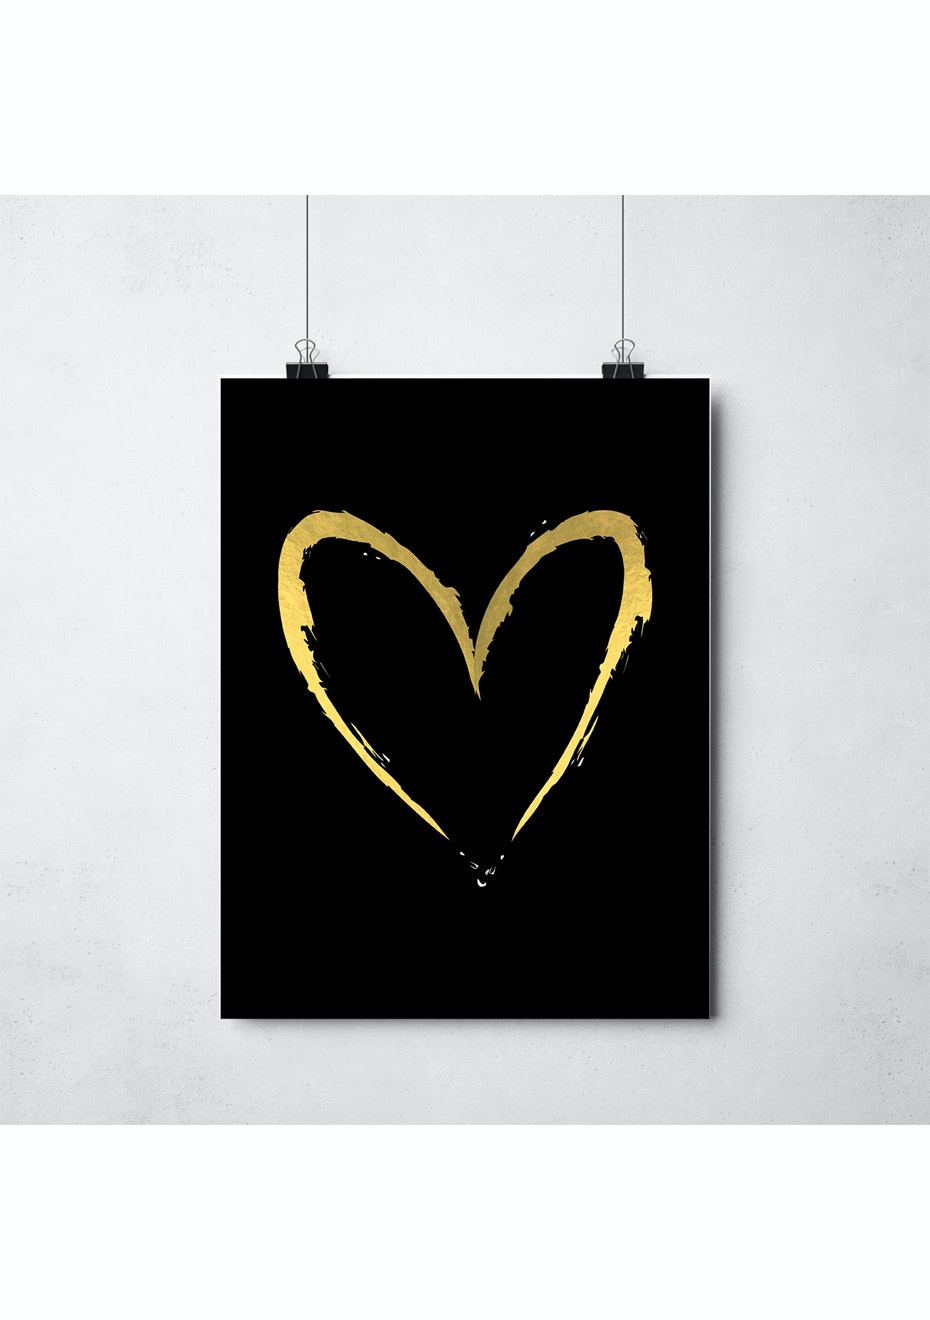 Simply Creative - Gold Heart - A3 Gold Foil Print